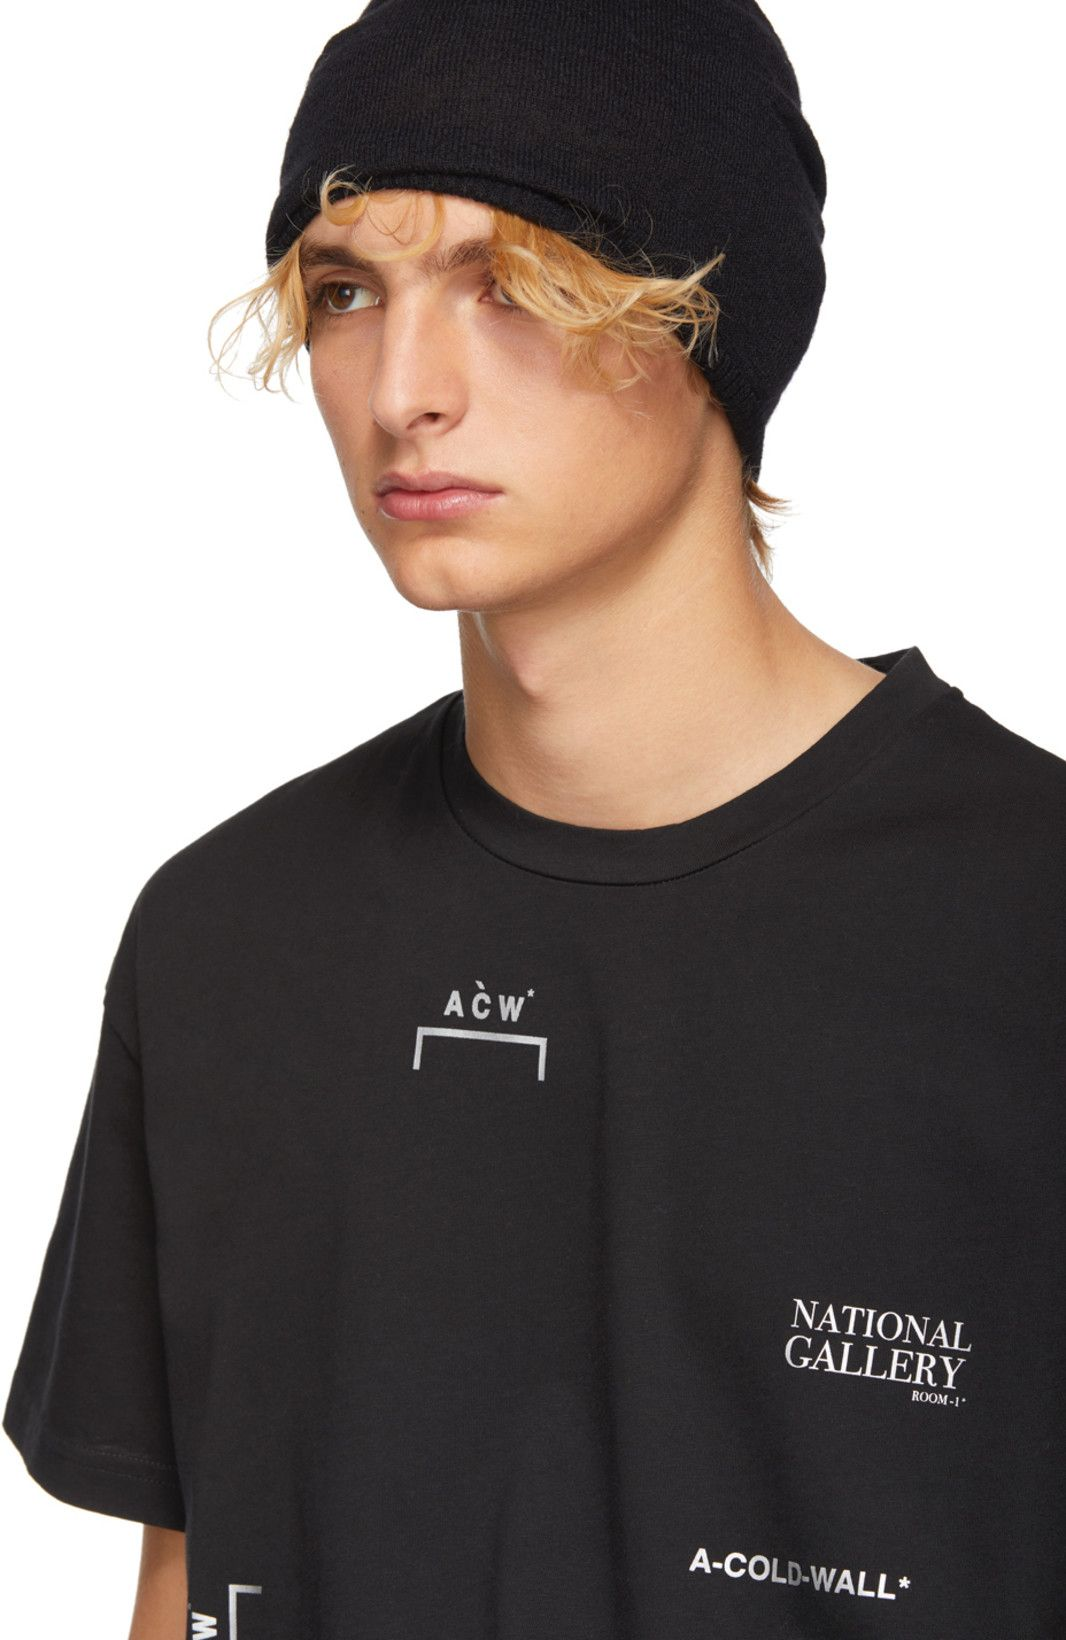 f197d92a3f49 A-Cold-Wall* - Black 'National Gallery' Multi Logo T-Shirt | URBAN ...